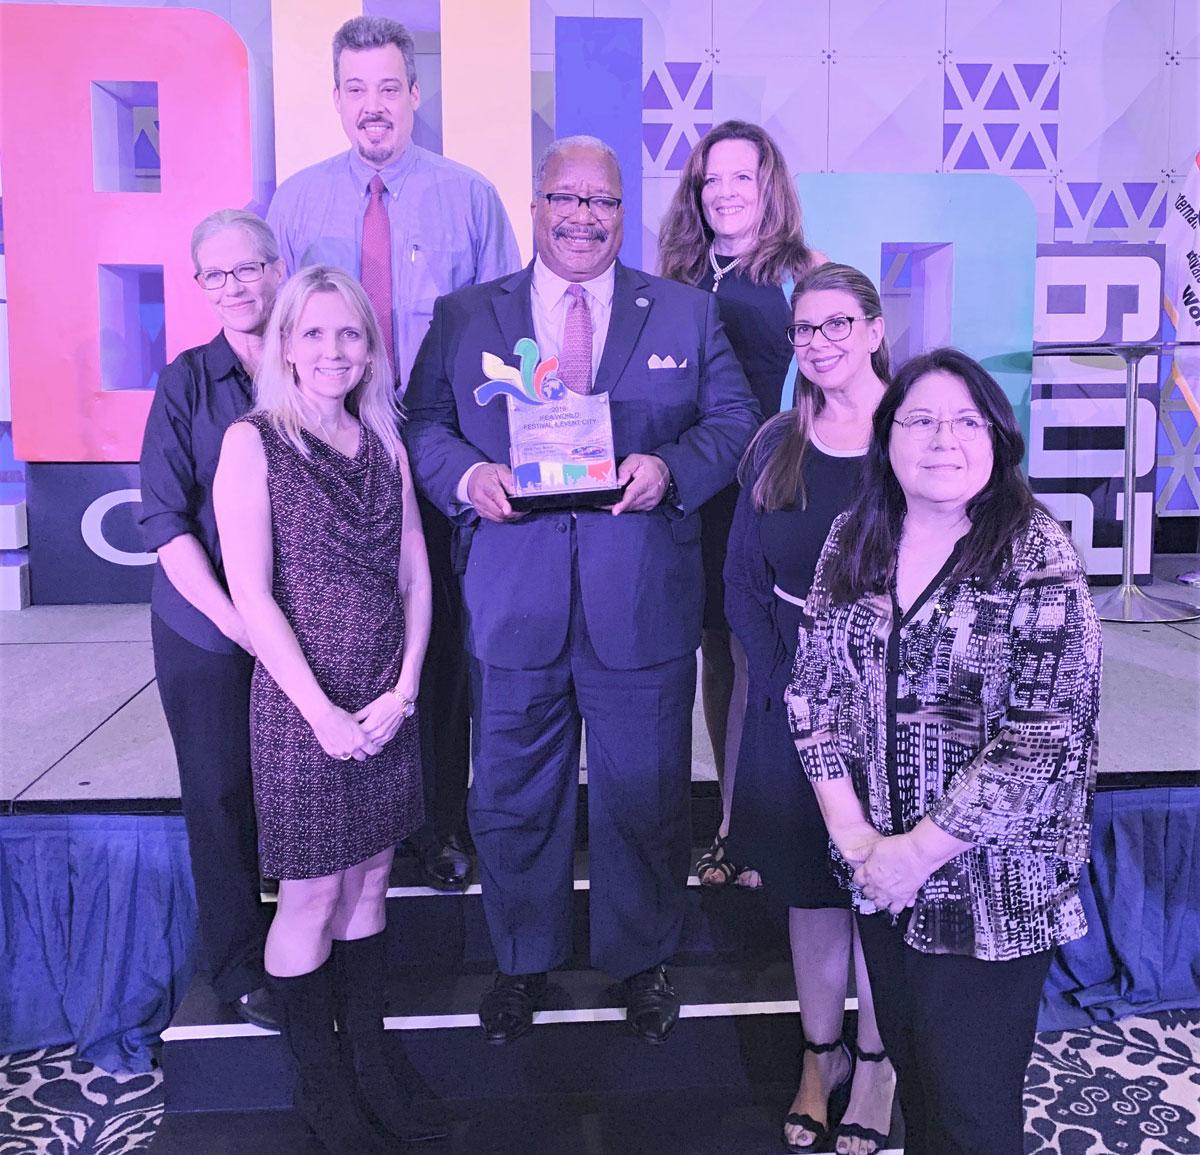 West Palm Beach In 2019: West Palm Beach Recipient Of The 2019 IFEA